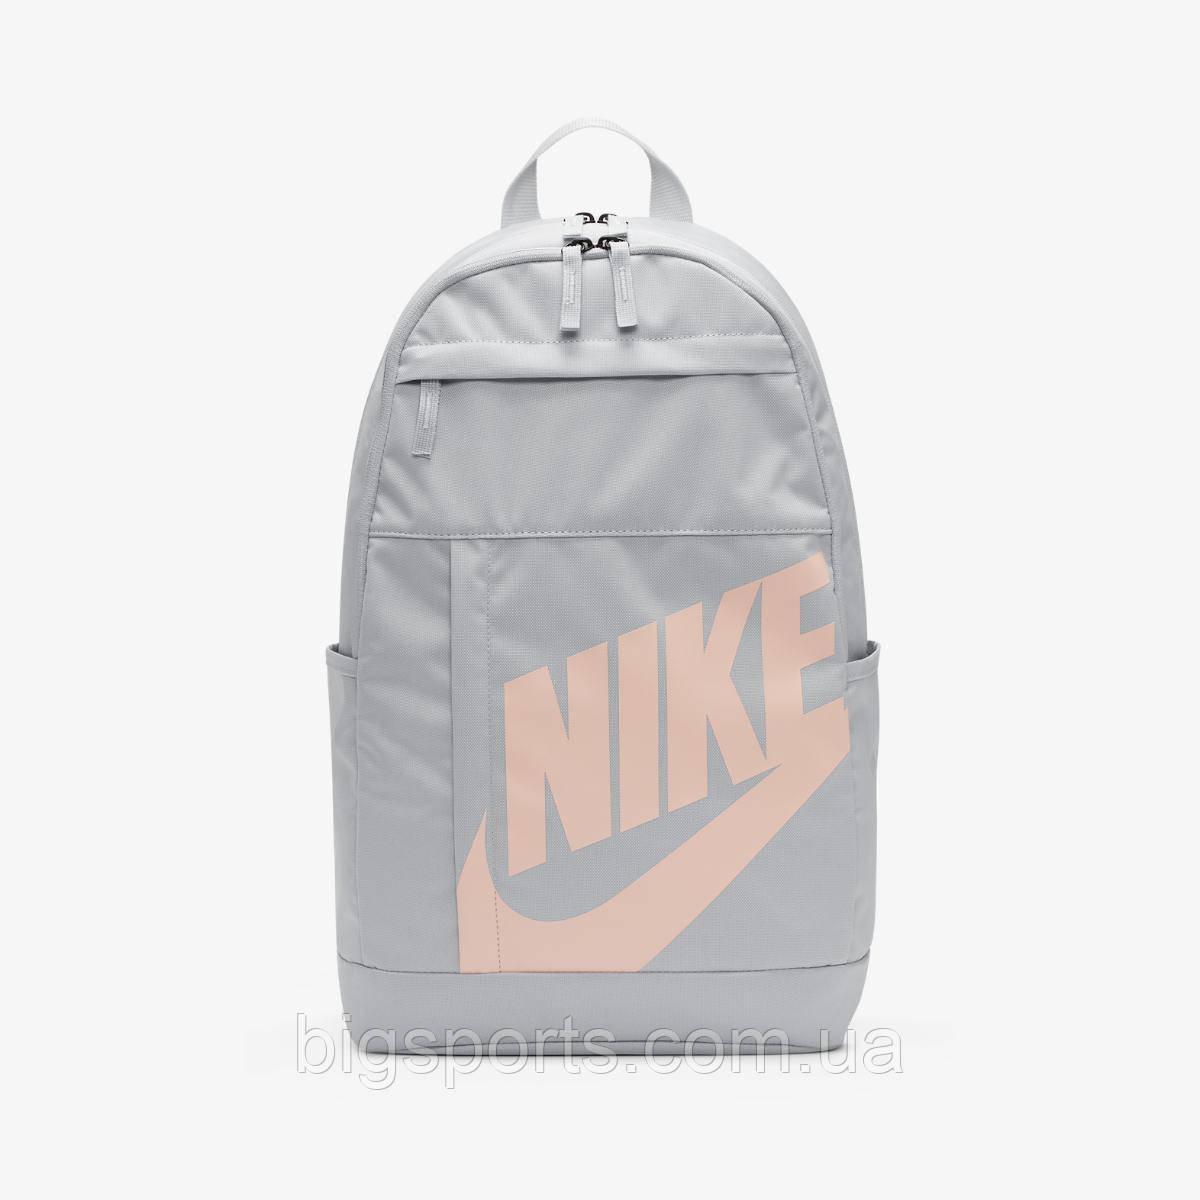 Рюкзак спортивный Nike Elemental 2.0 (арт. BA5876-042)